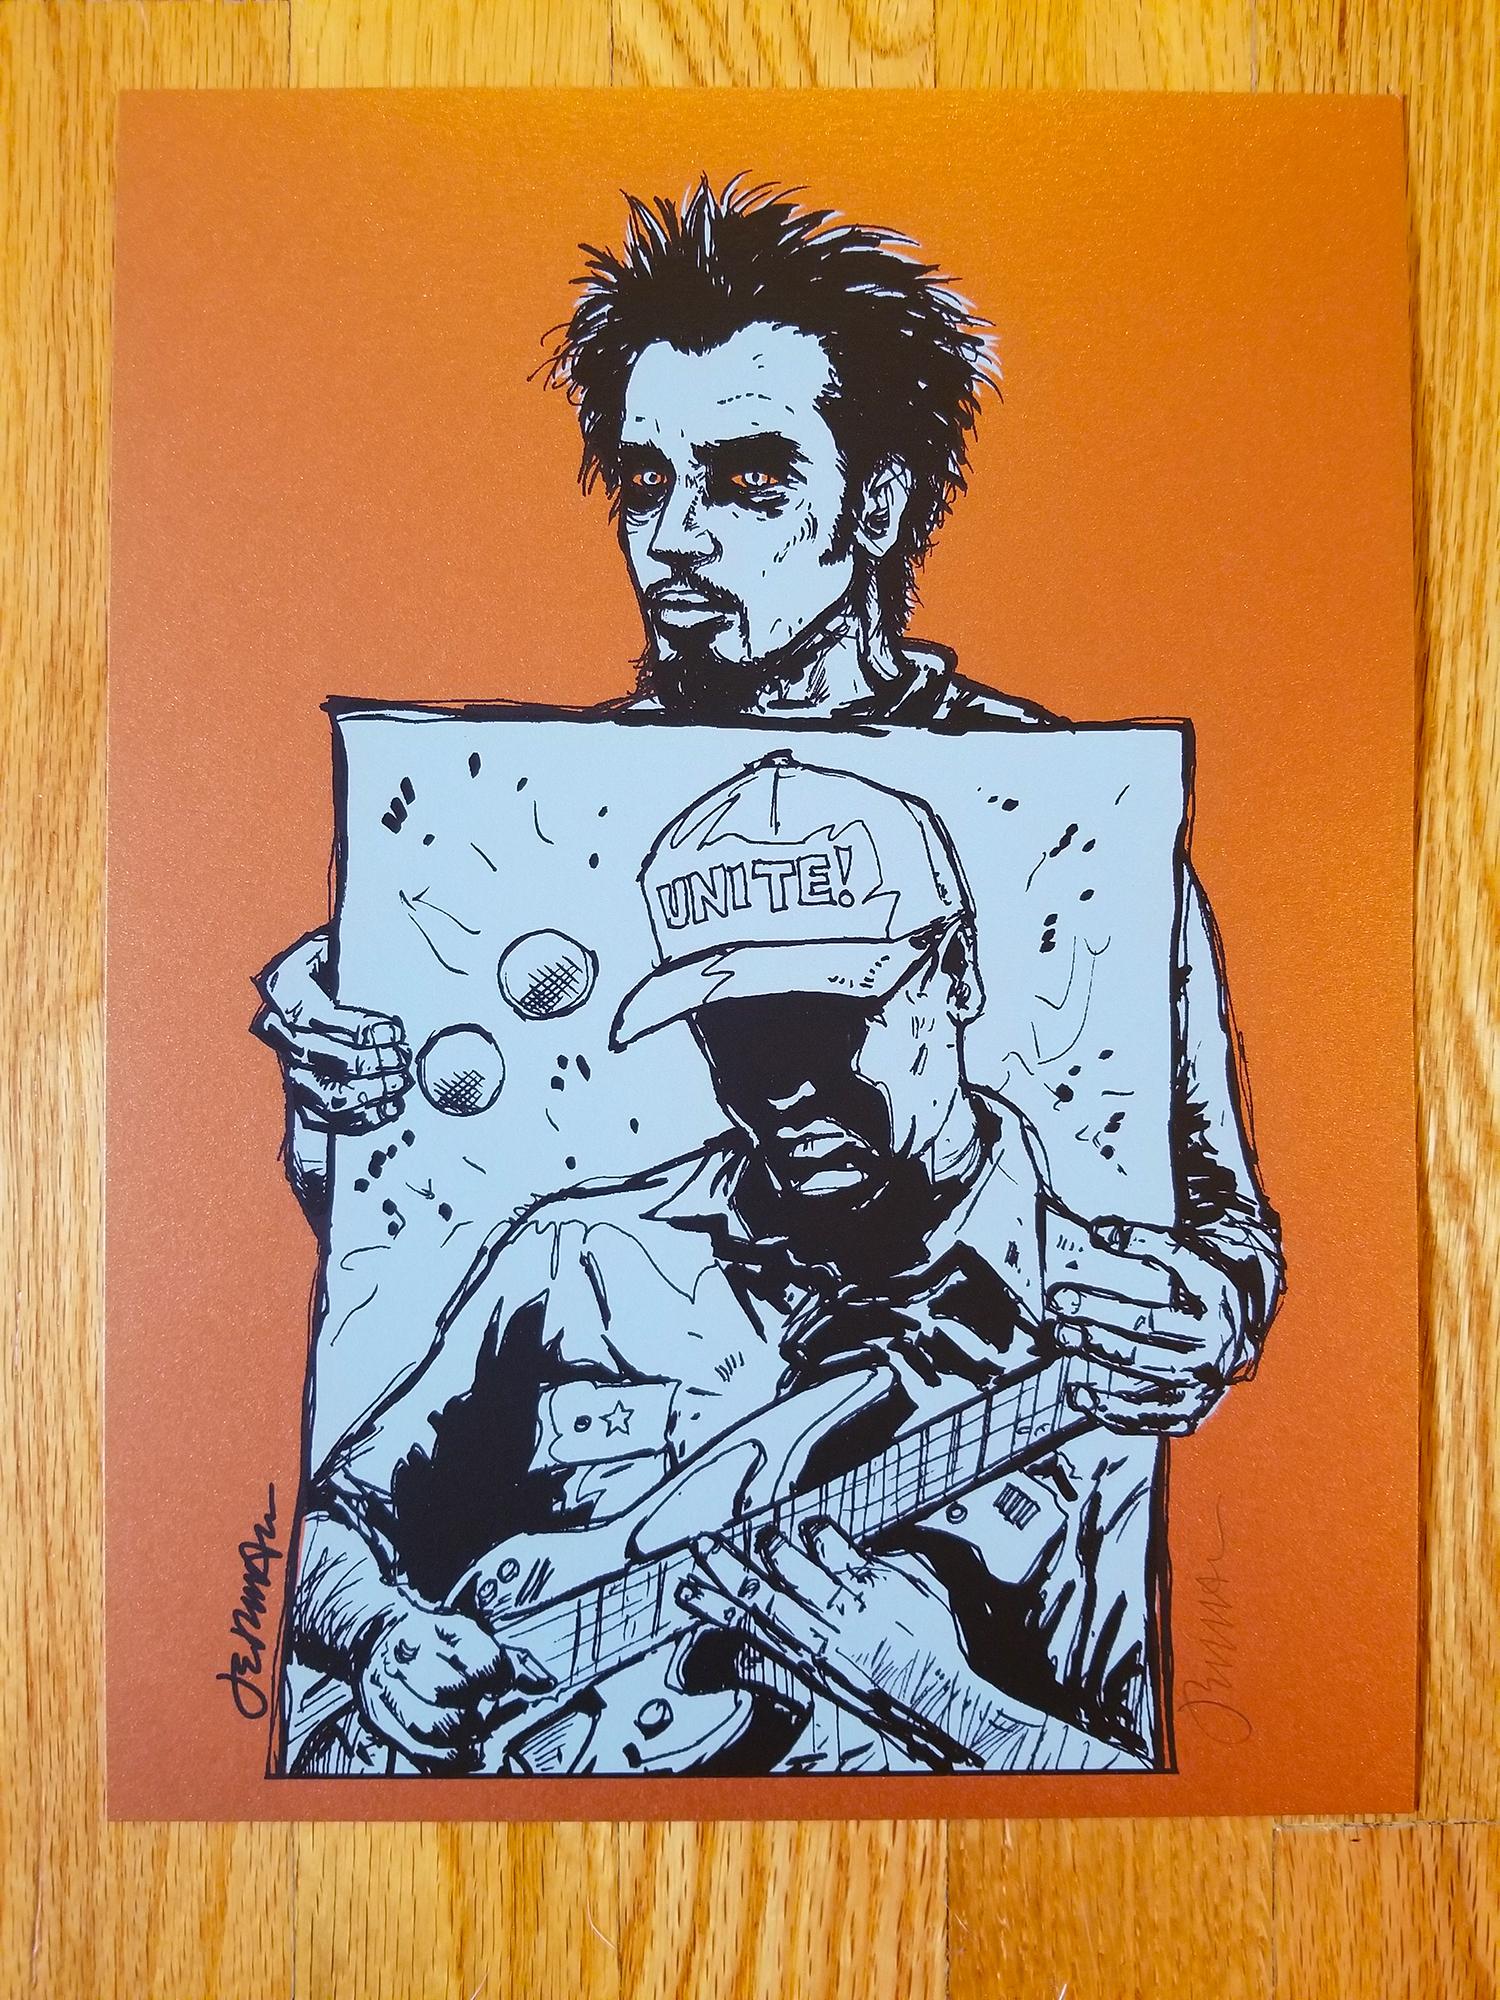 NEW - 'Slaves' (Chris Cornell / Tom Morello / Audioslave) Mini Art Print (STARDREAM GOLD)